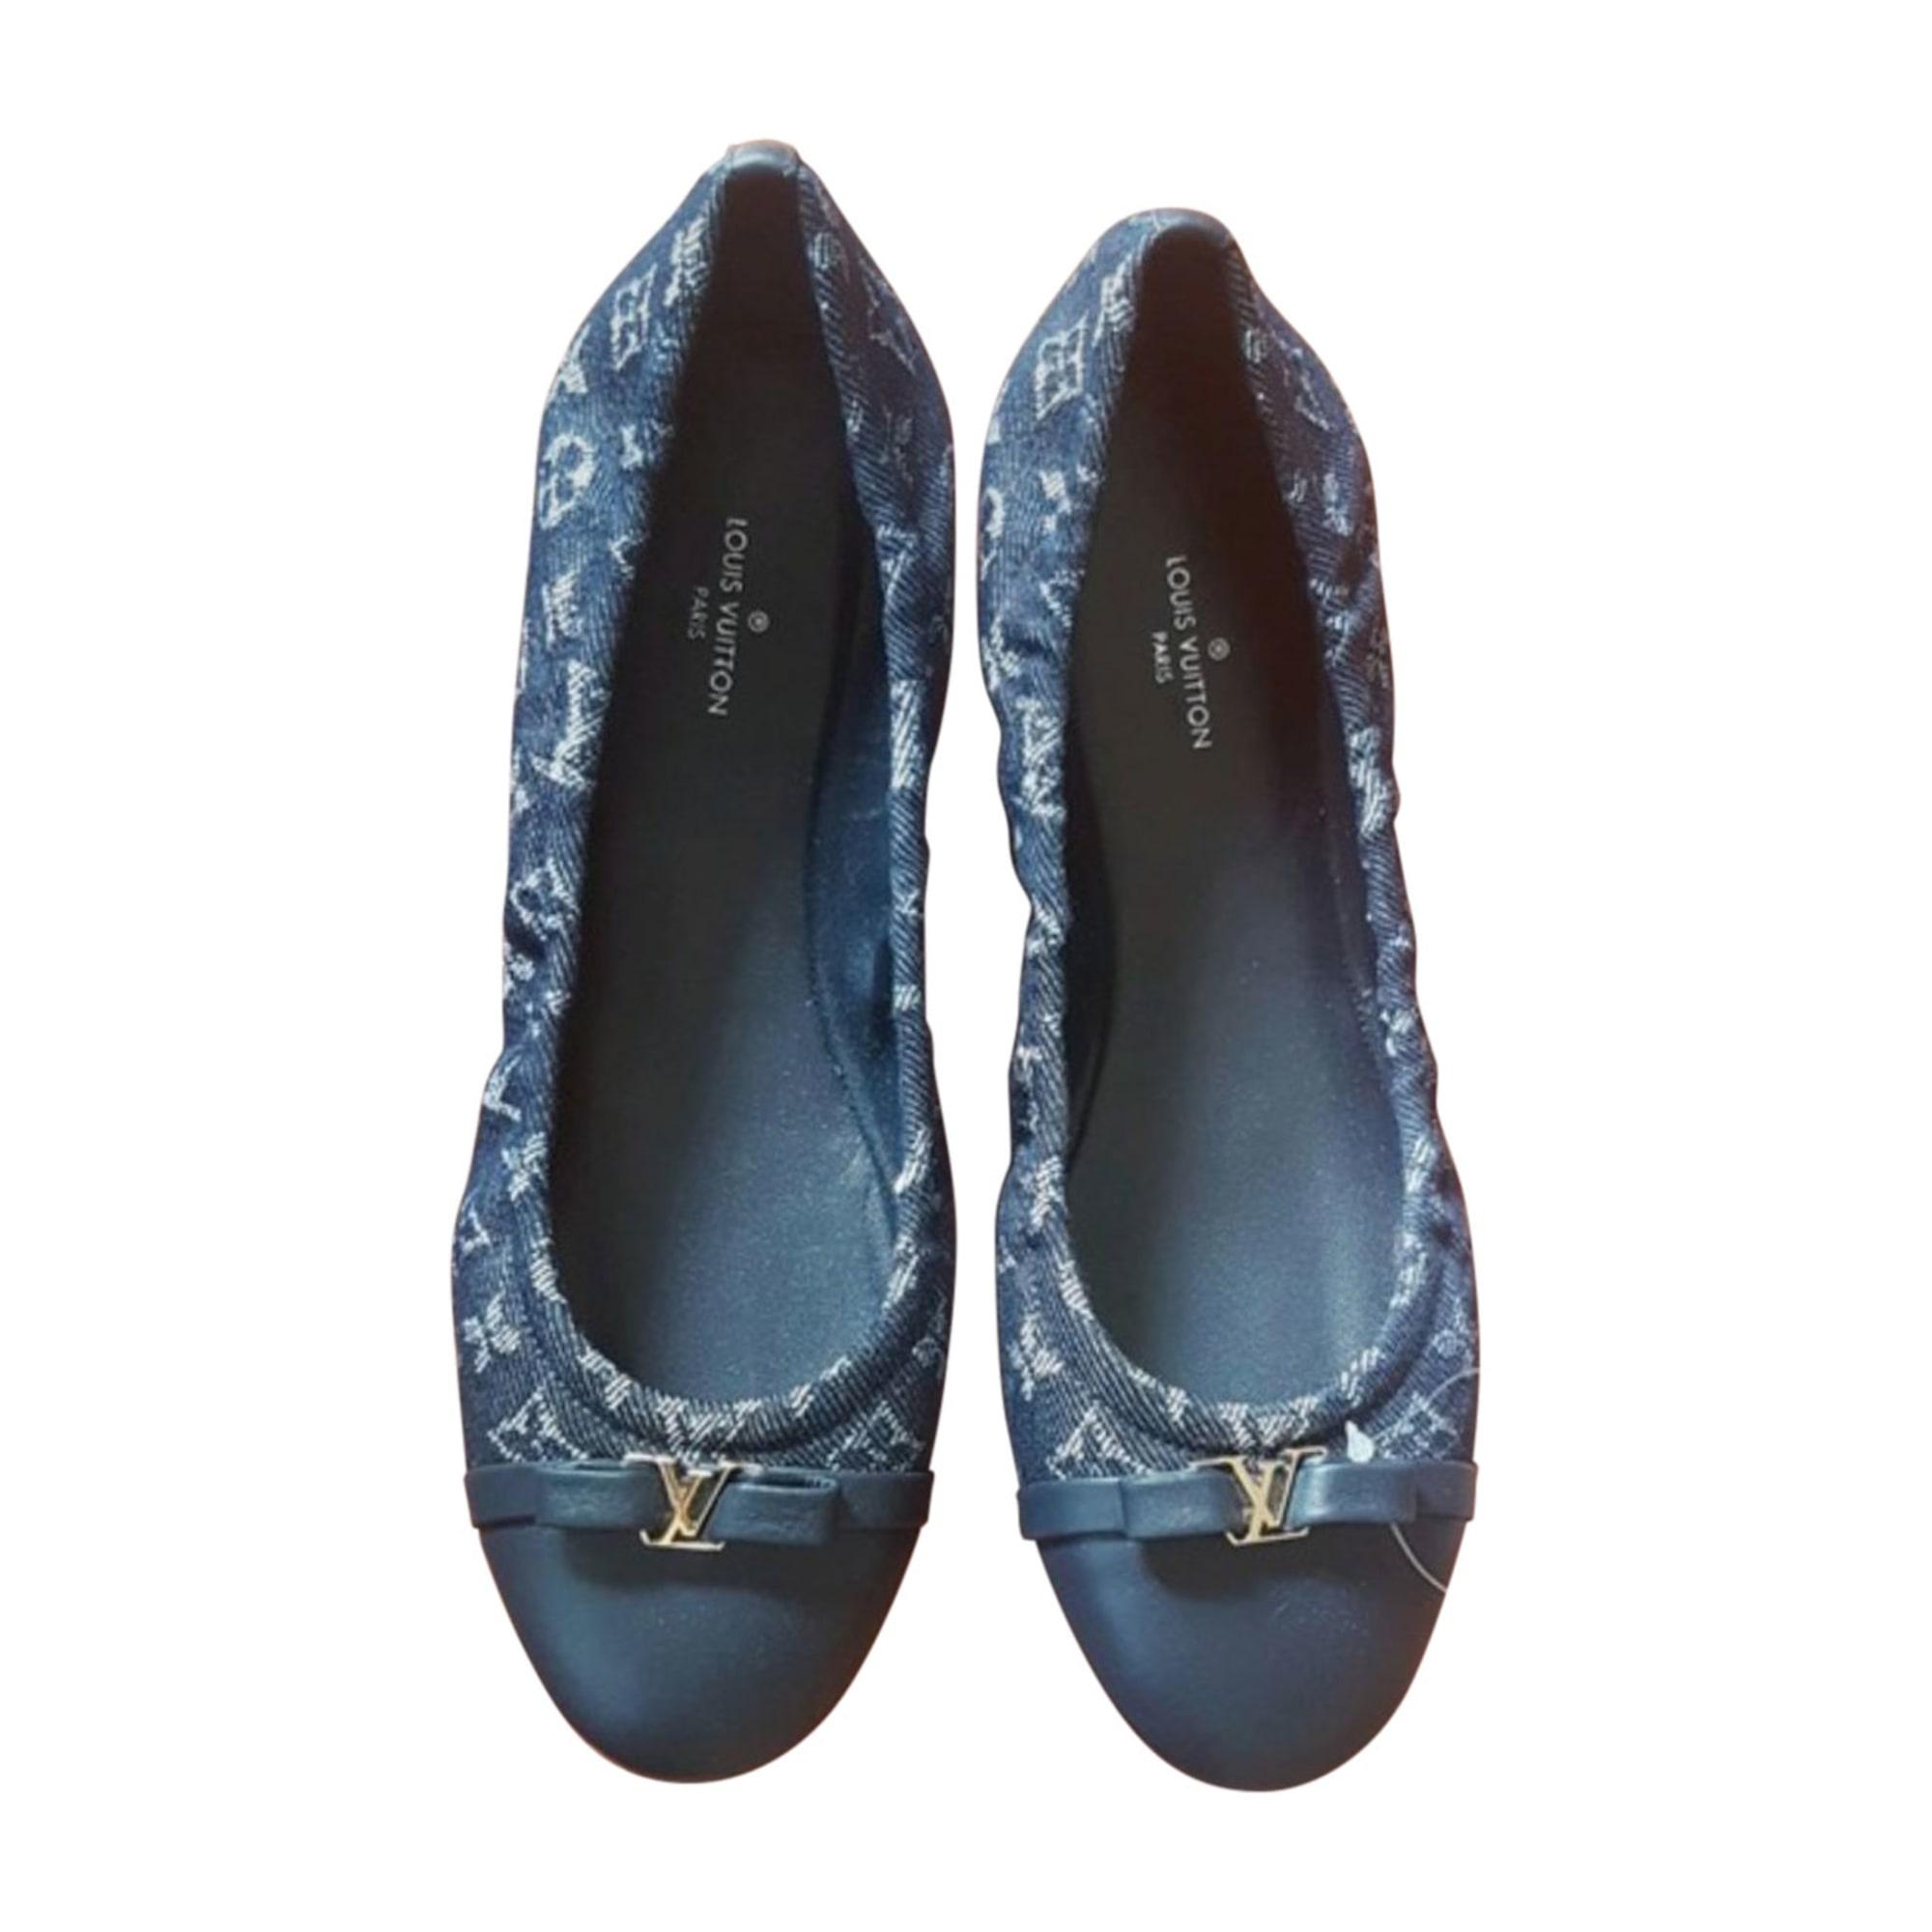 Ballet Flats LOUIS VUITTON Blue, navy, turquoise